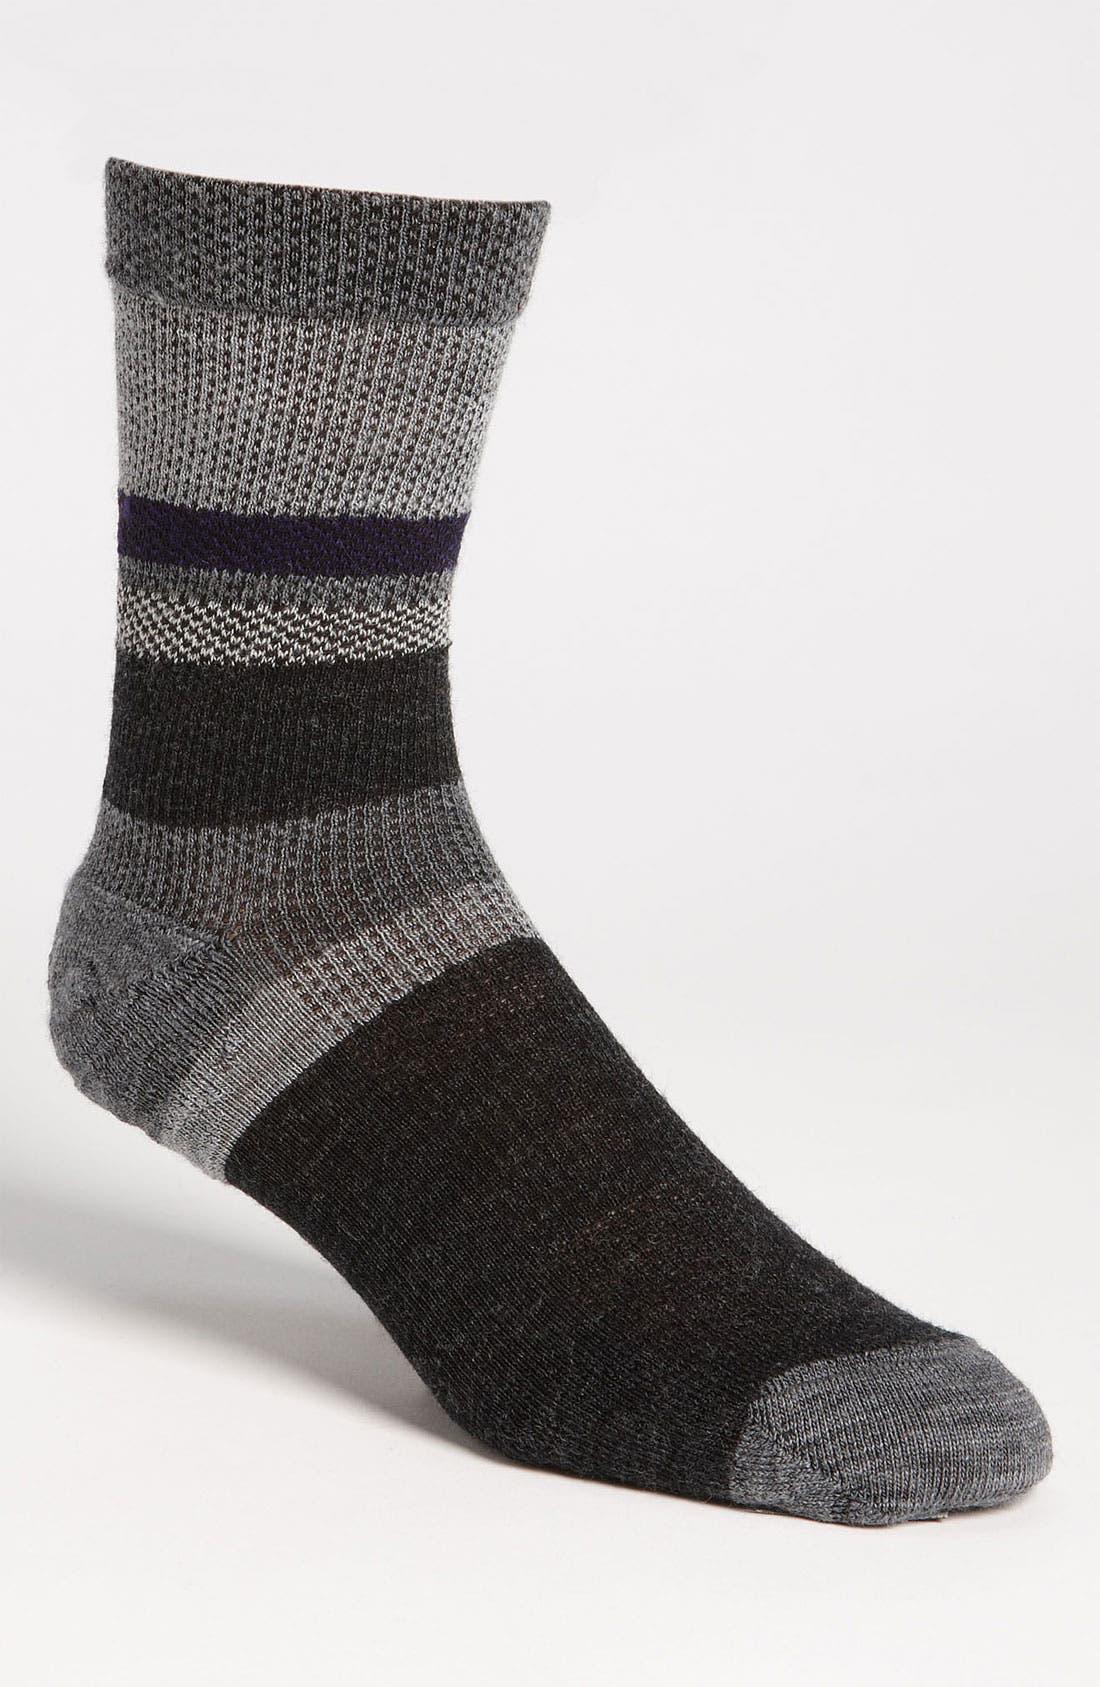 Alternate Image 1 Selected - Smartwool 'Distressed Stripe' Socks